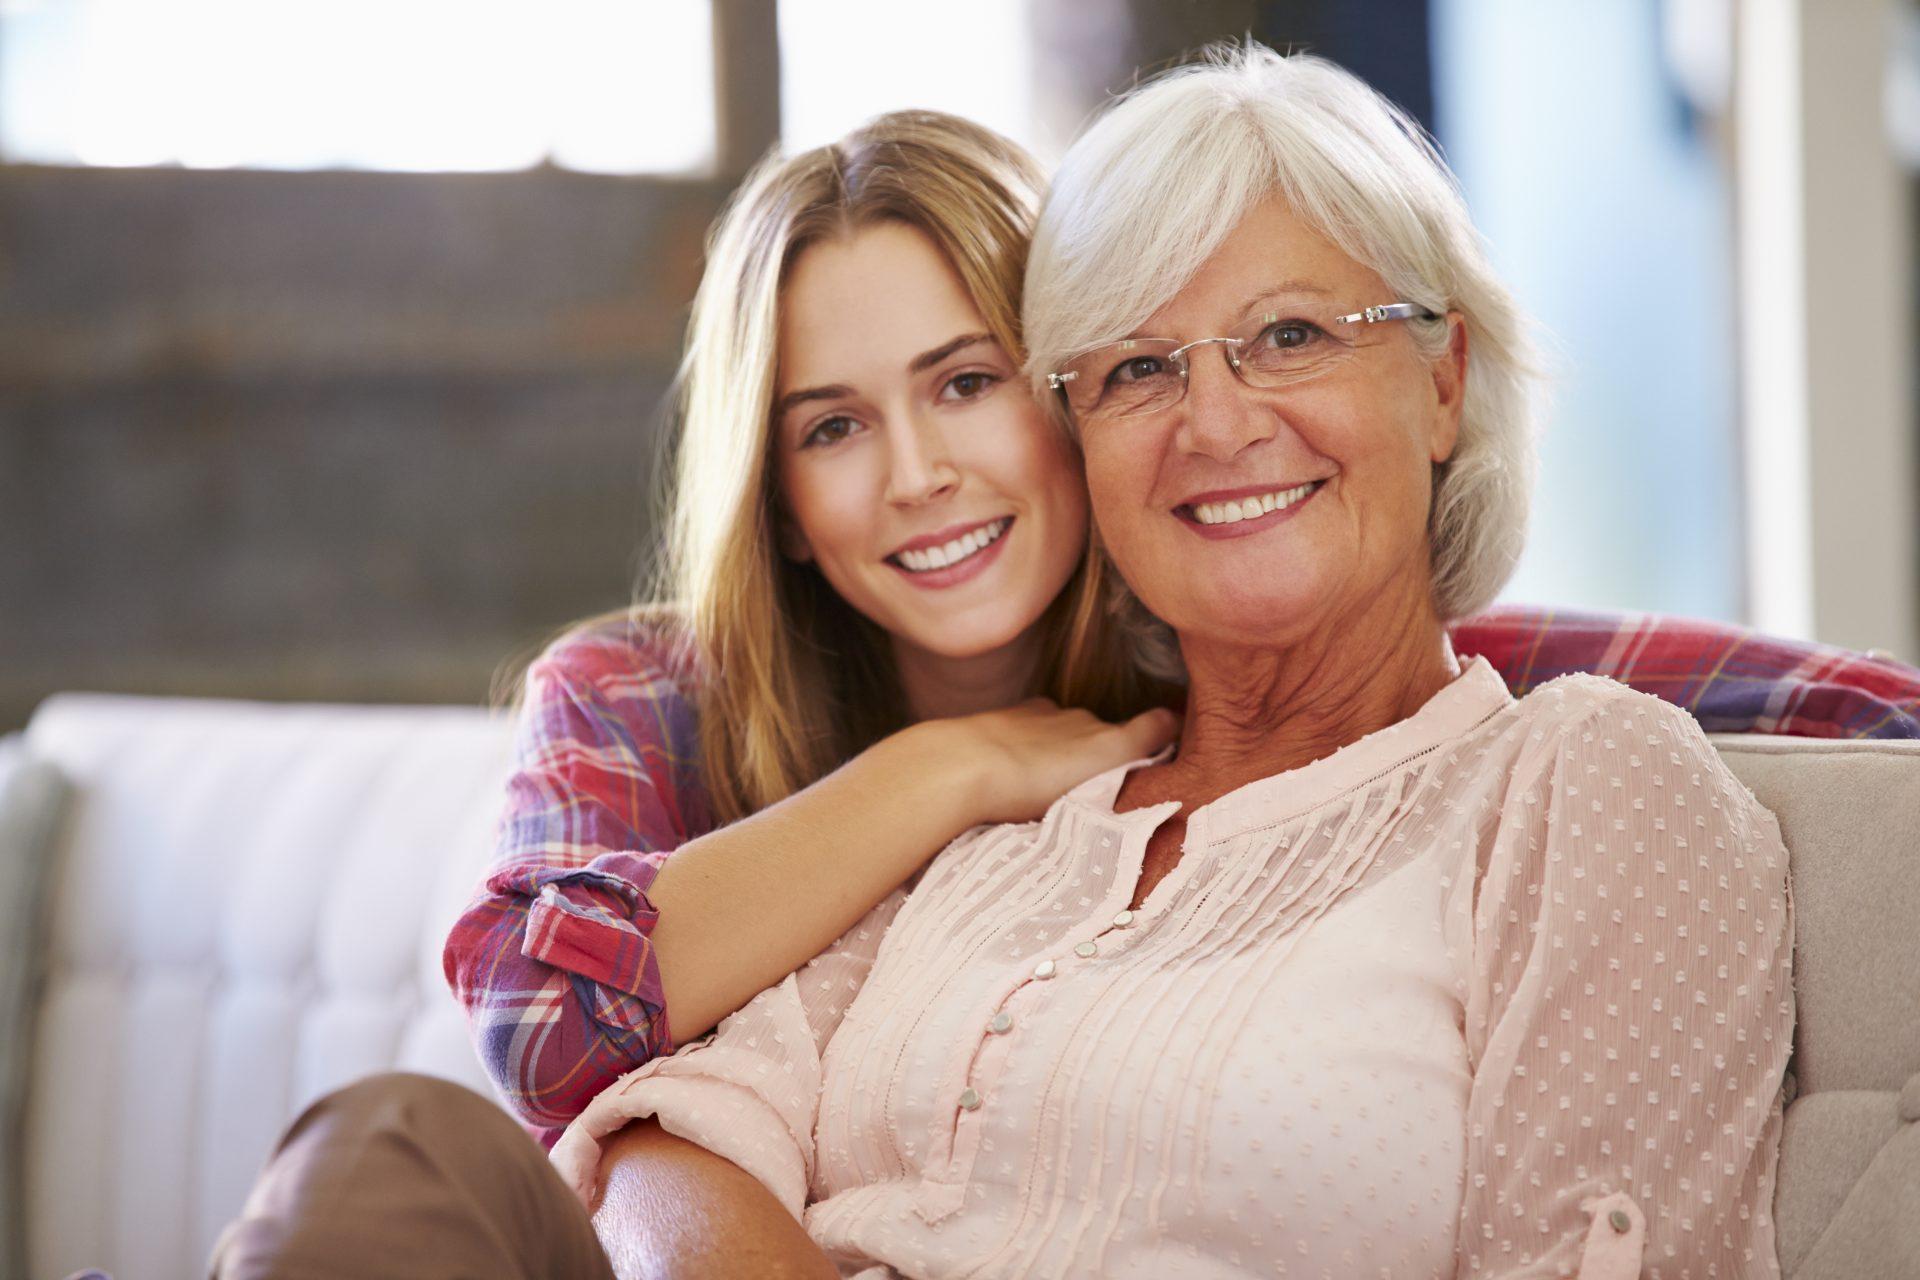 Smiling Senior and Granddaughter